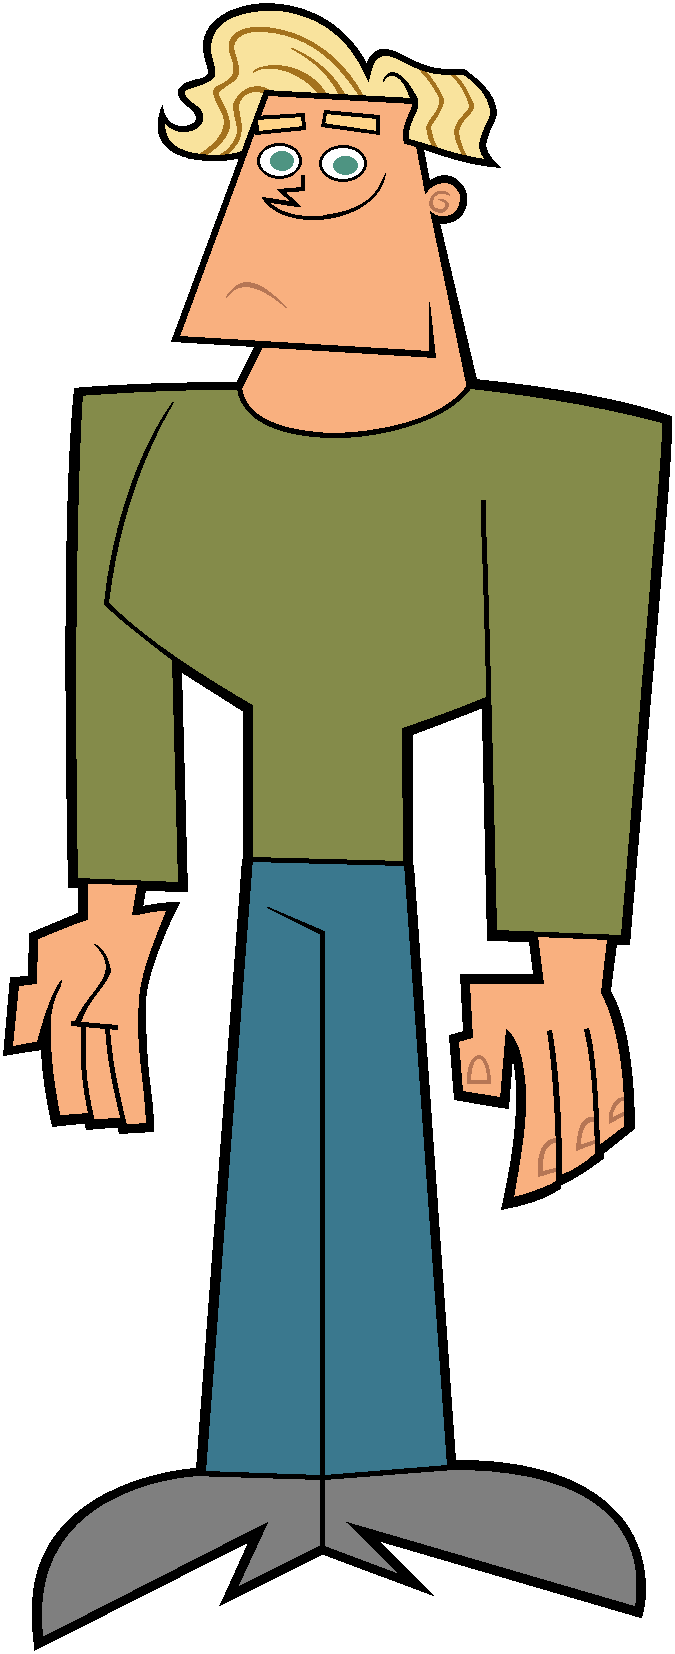 Chester McBadbat (The Fairly OddParents: The Next Generation)/Info